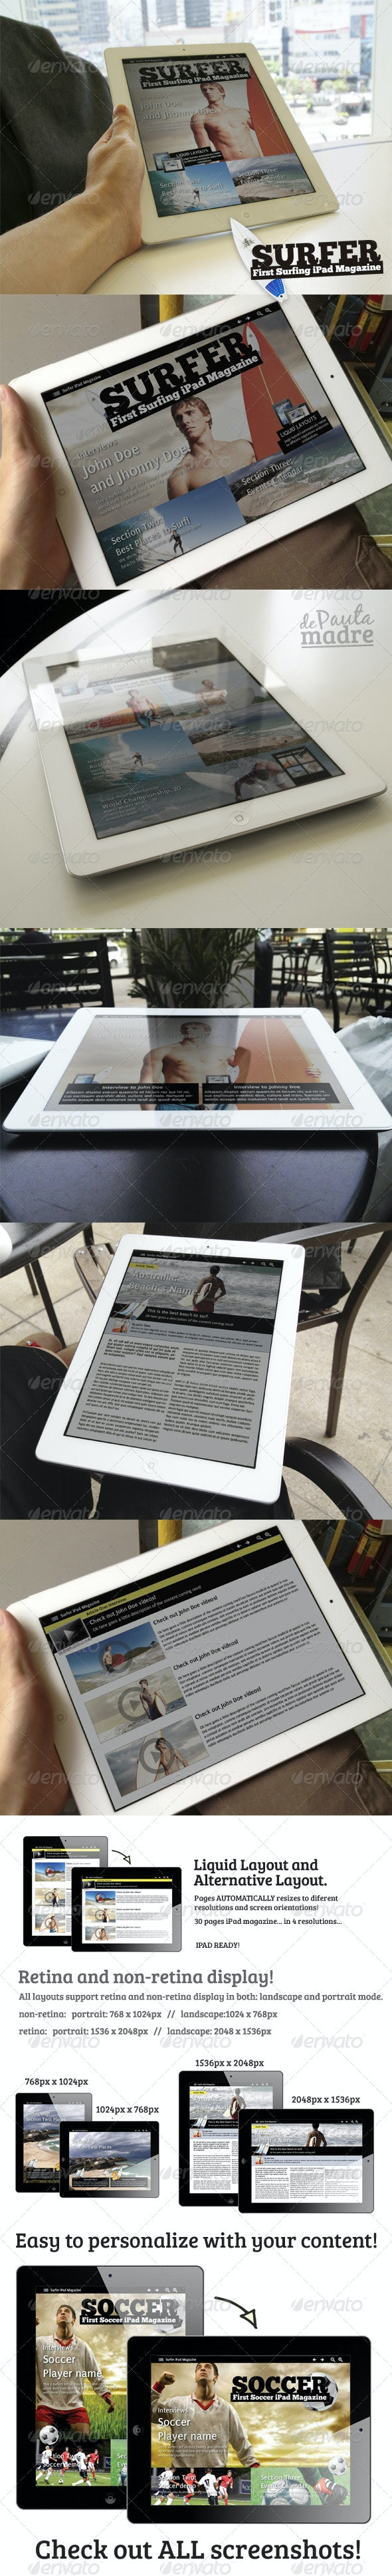 Exclusive Sports iPad Magazine in 4 Resolutions - Digital Magazines ePublishing